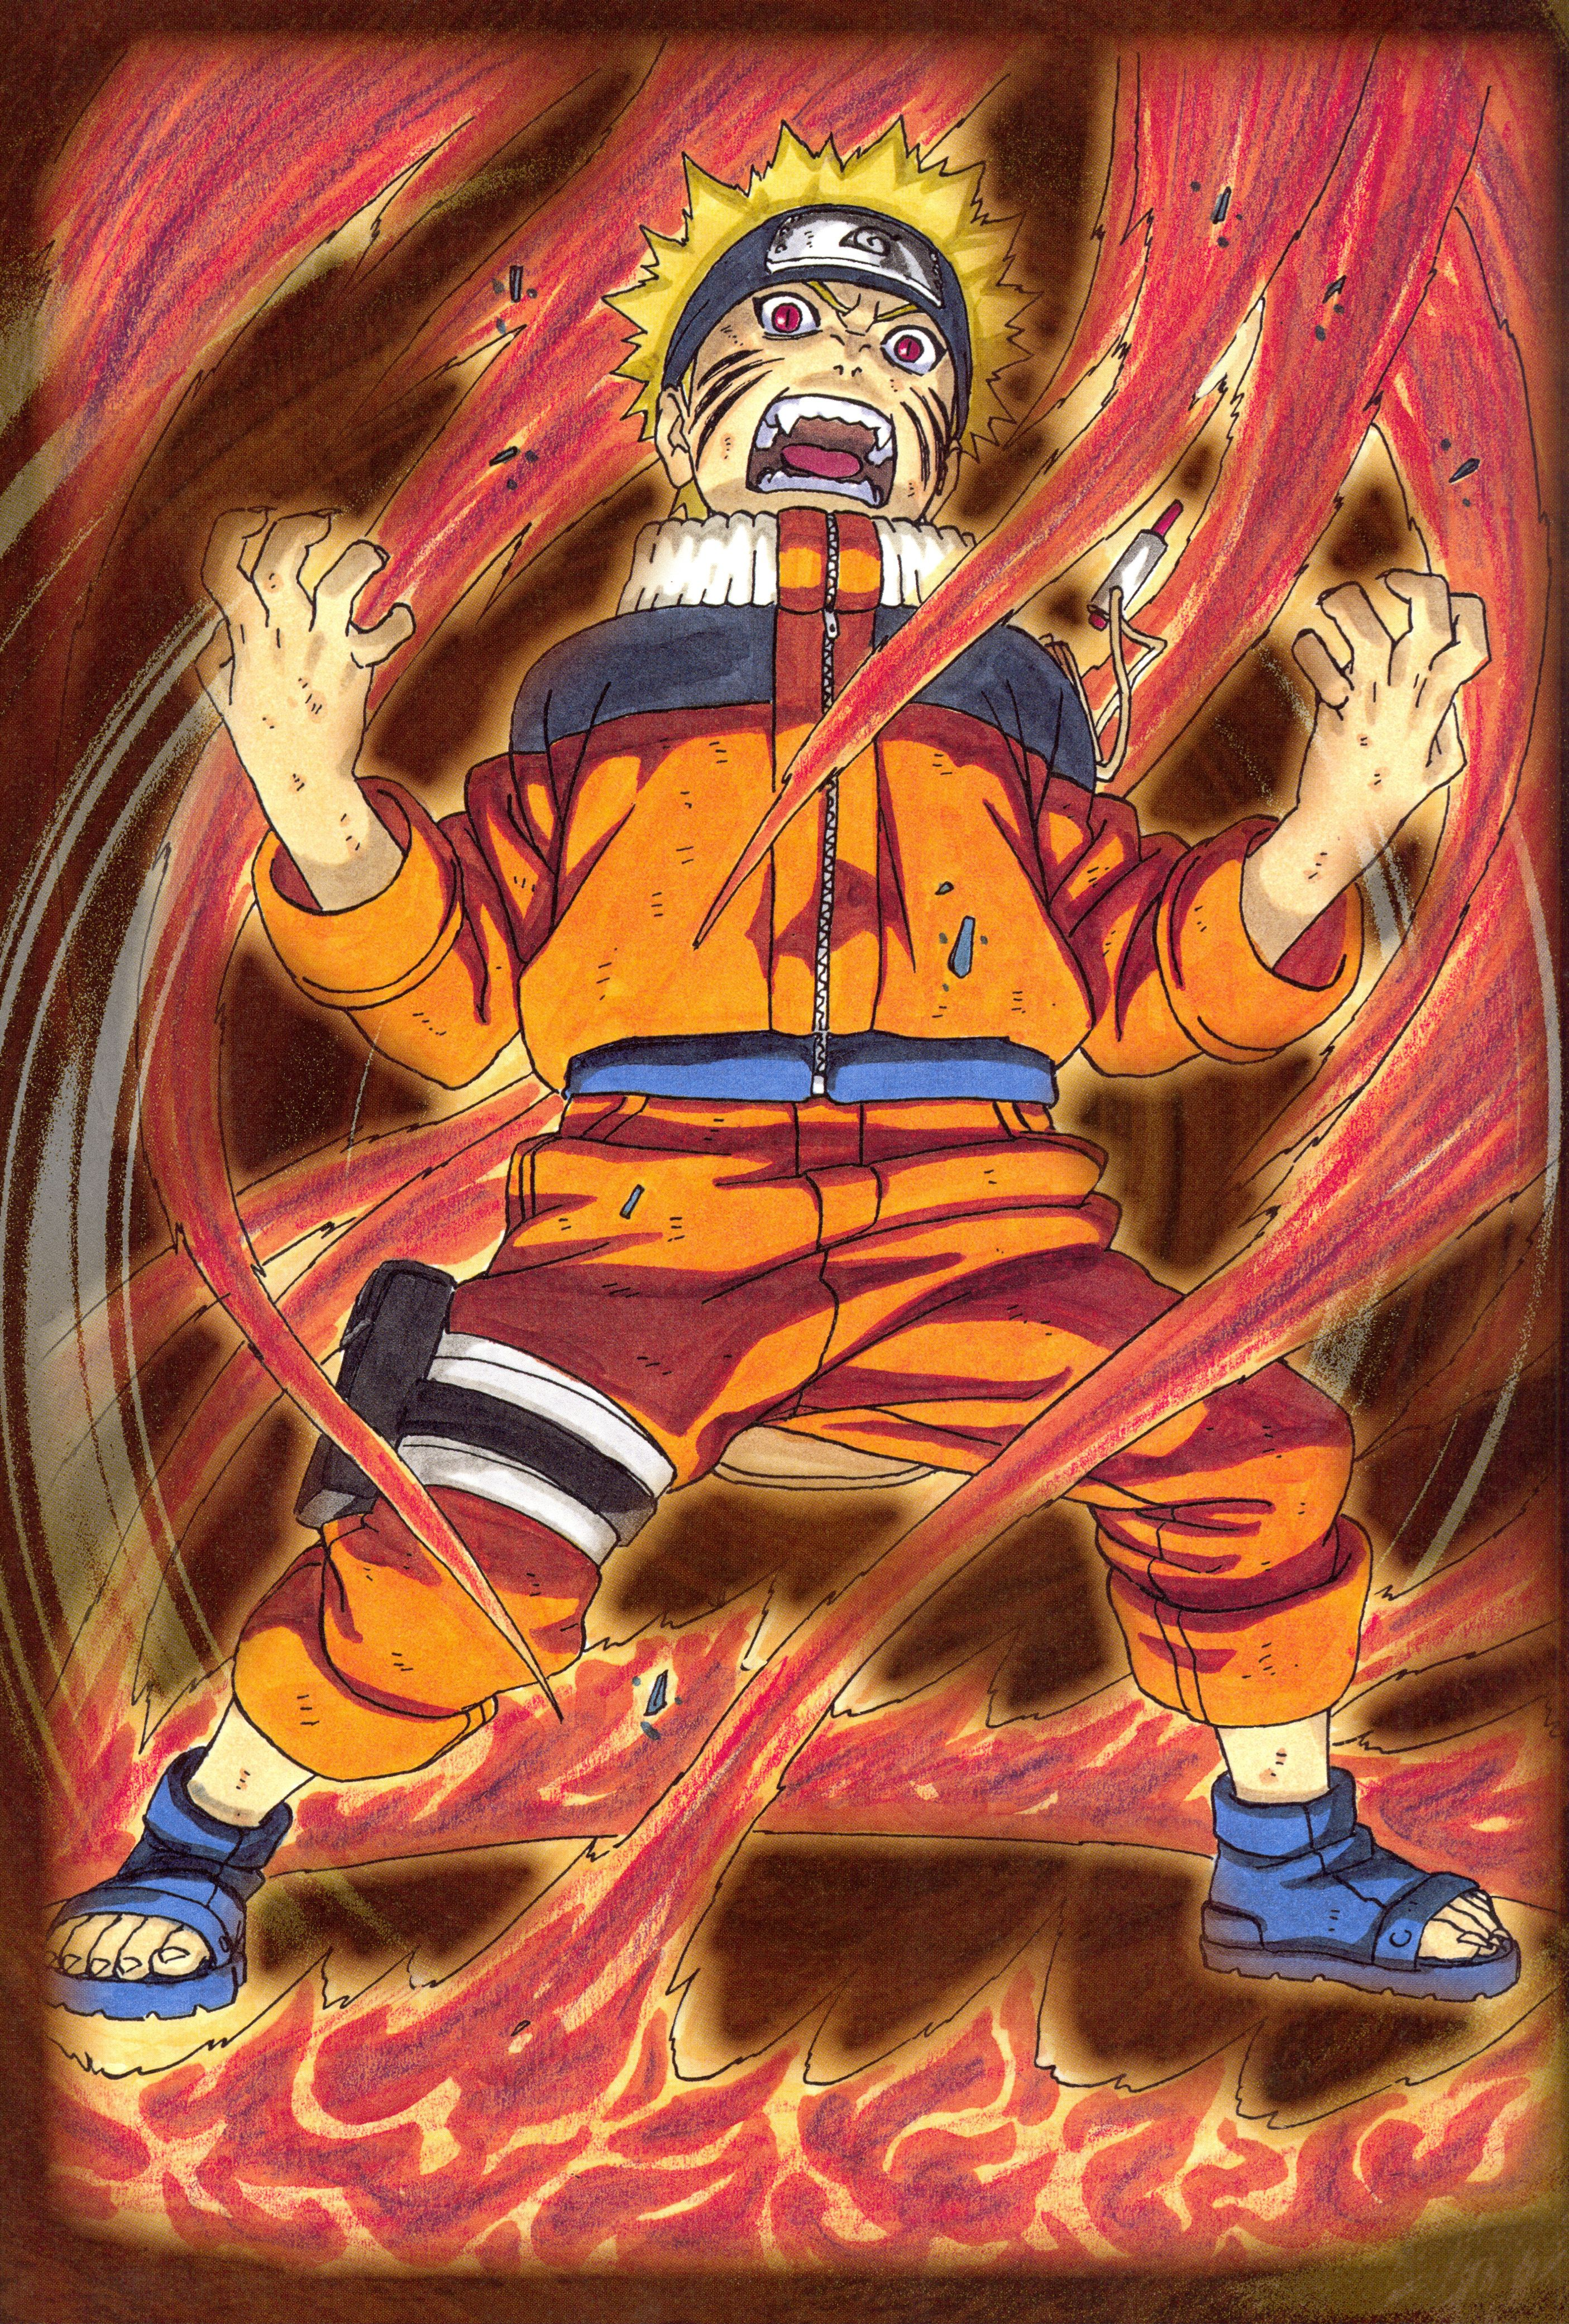 Naruto Wallpapers For Mobile Naruto Shippuden Anime Naruto Uzumaki Naruto Shippuden Sasuke